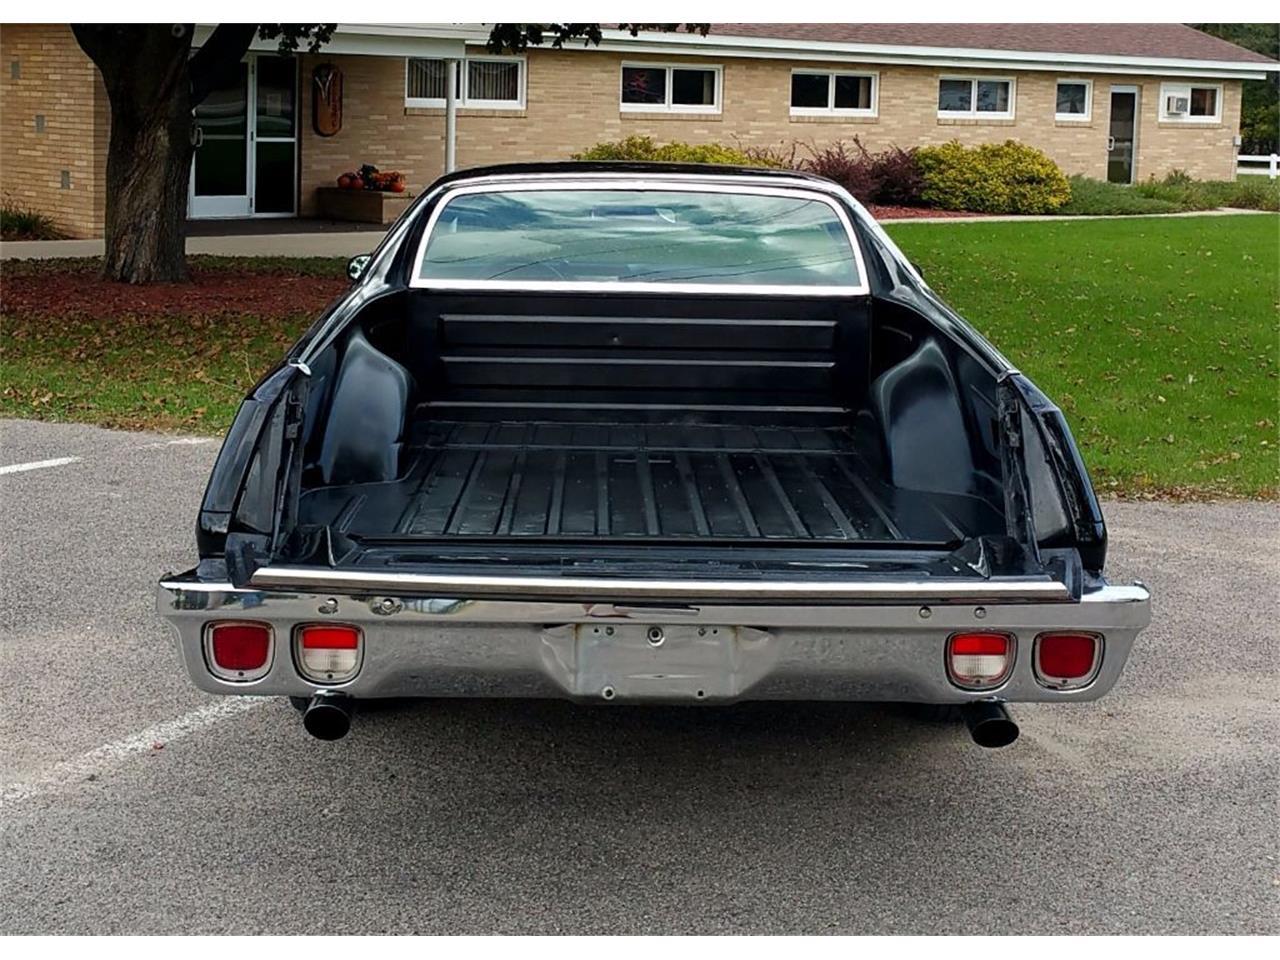 1975 Chevrolet El Camino (CC-911593) for sale in Maple Lake, Minnesota